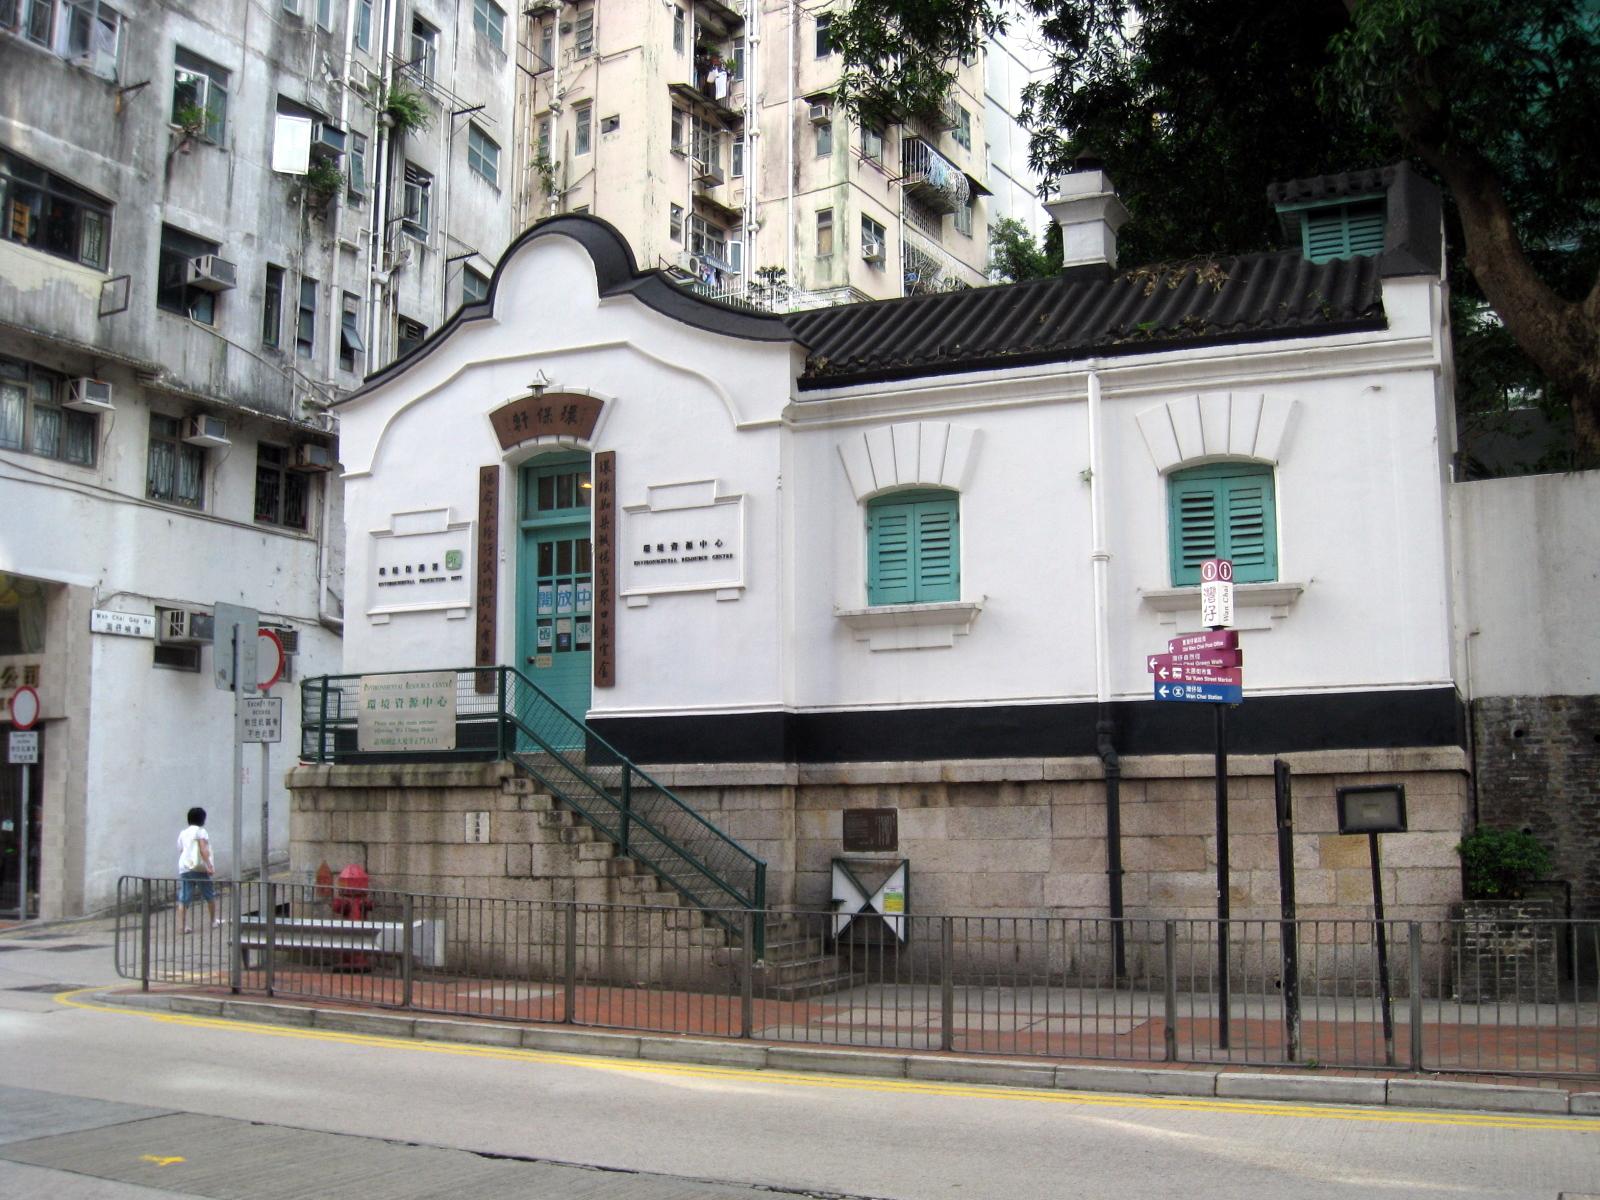 File:Old Wan Chai Post Office.jpg - 维基百科,自由的百科全书